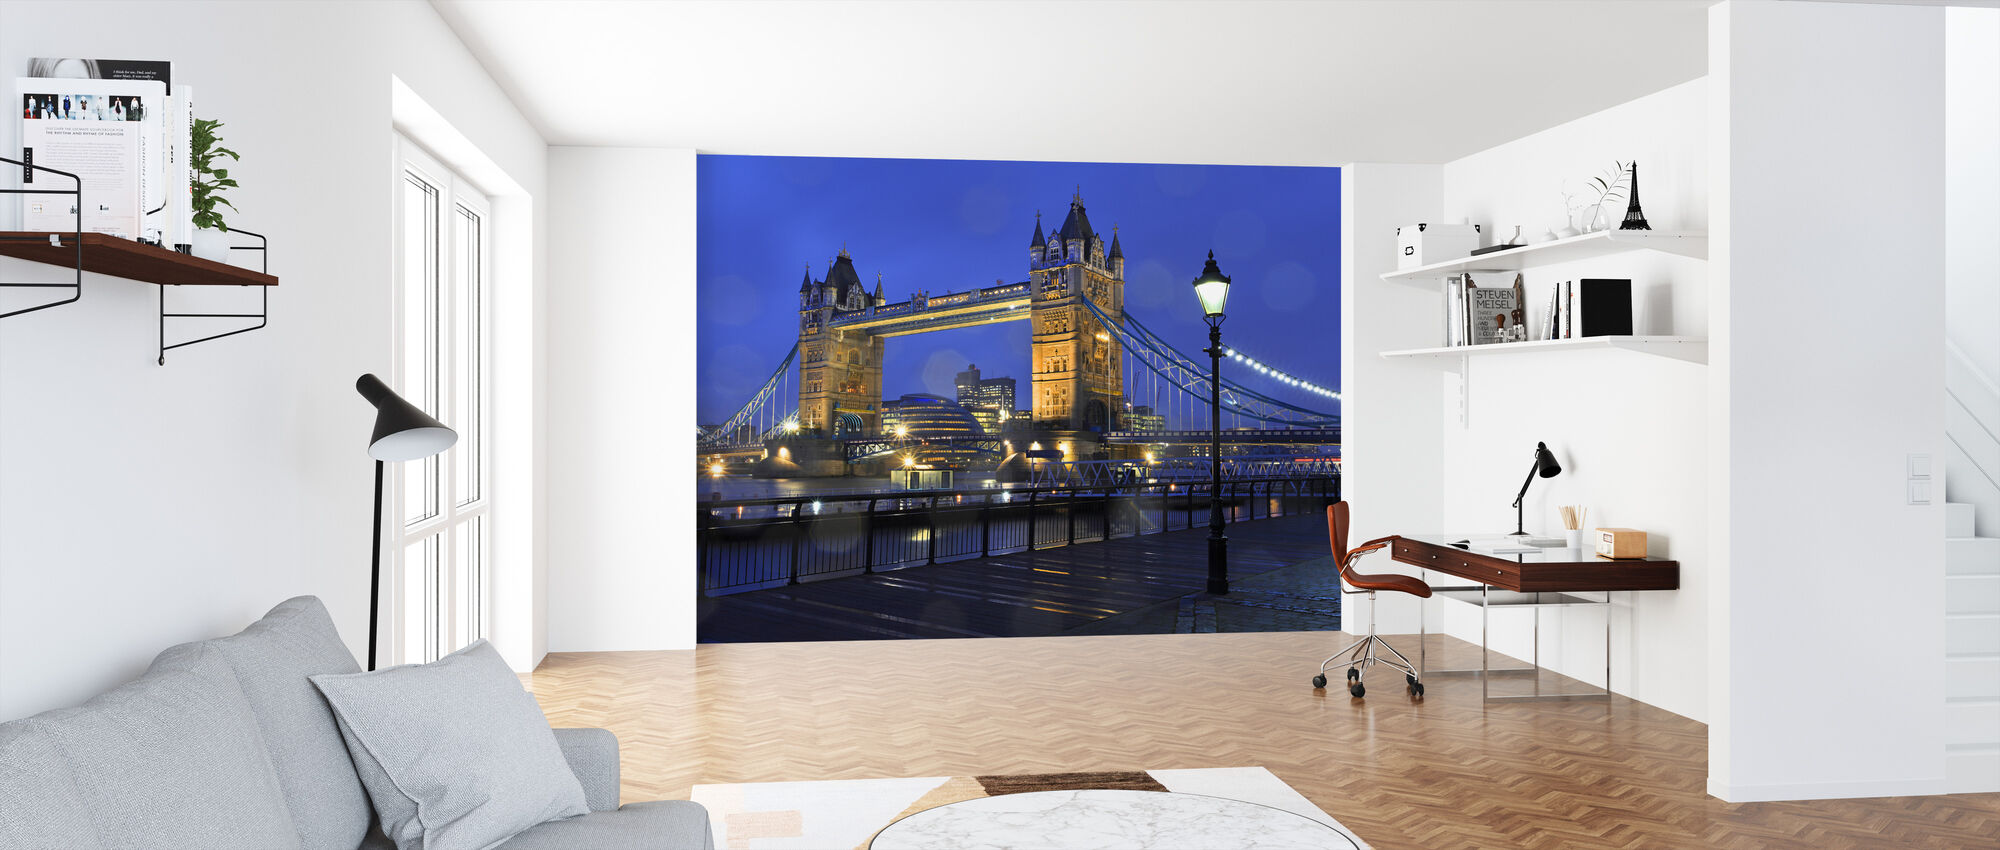 Tower Bridge London - Wallpaper - Office